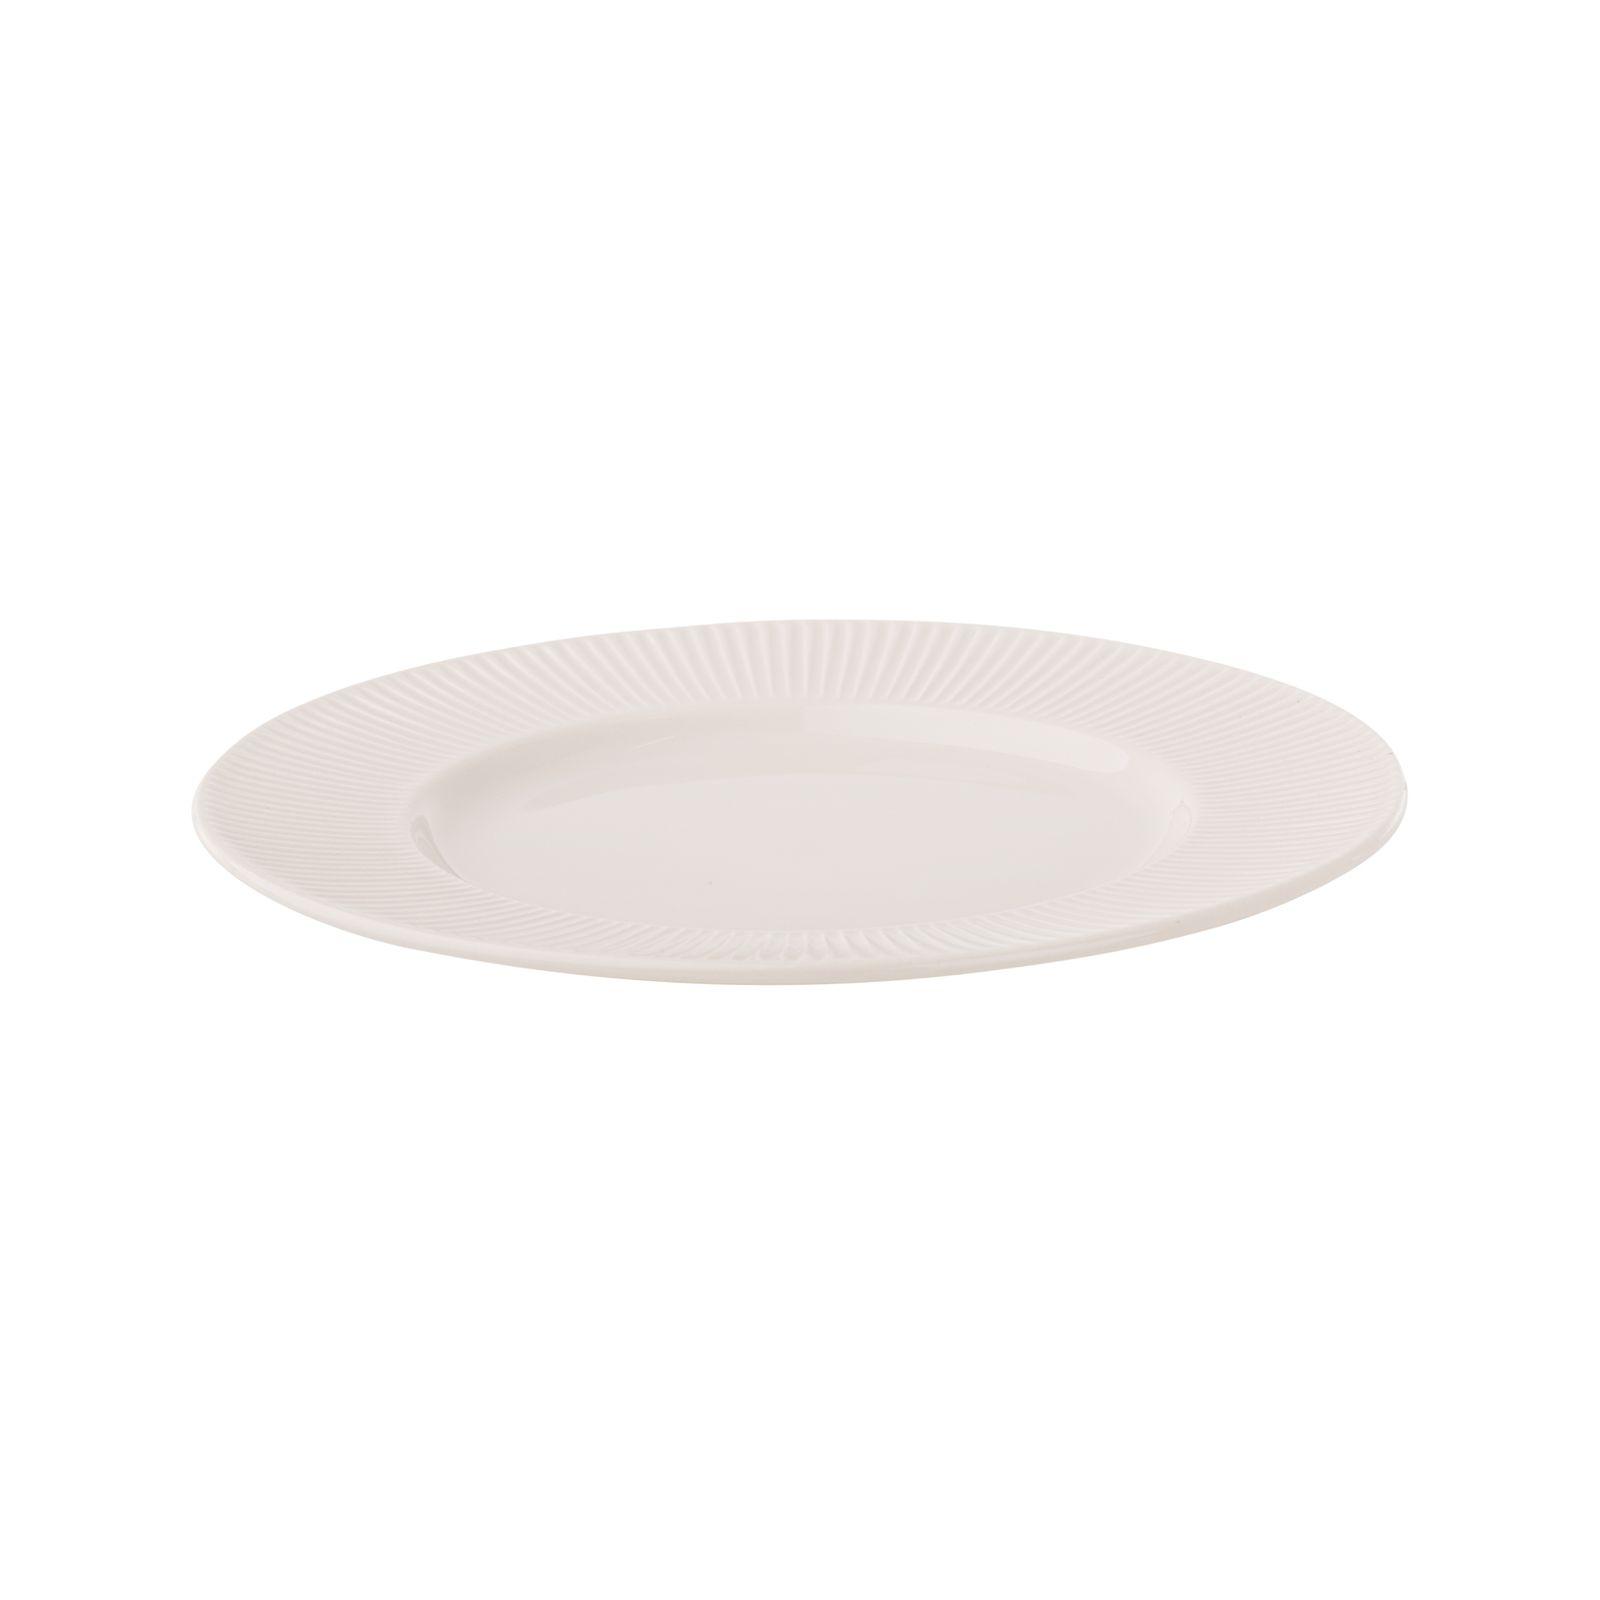 Dinner plate Palette 27 cm AMBITION Tasty cream